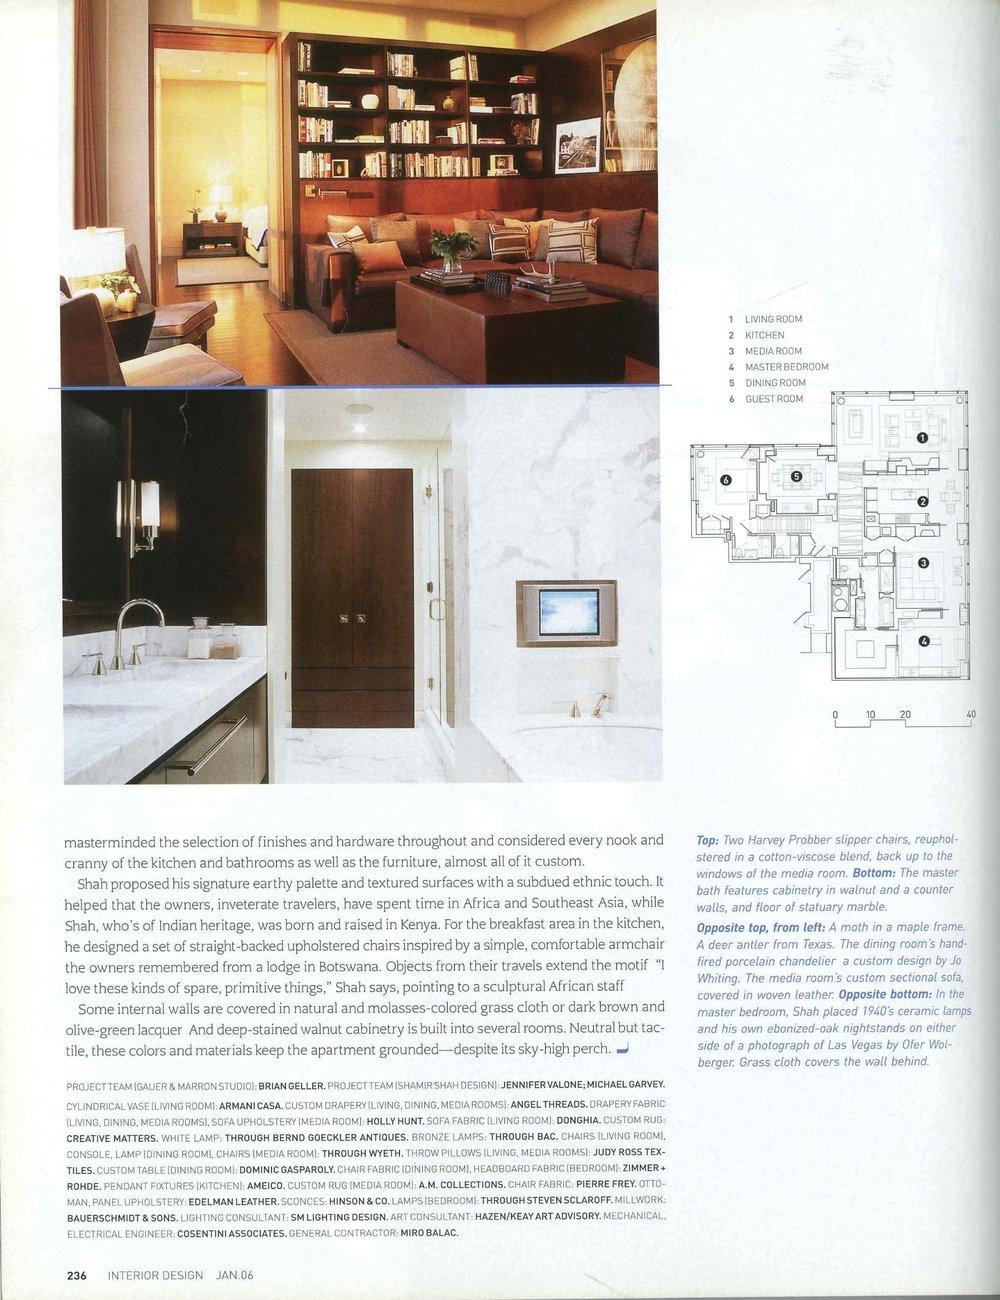 Interior Design_Jan 06_Full Article_Page_8.jpg